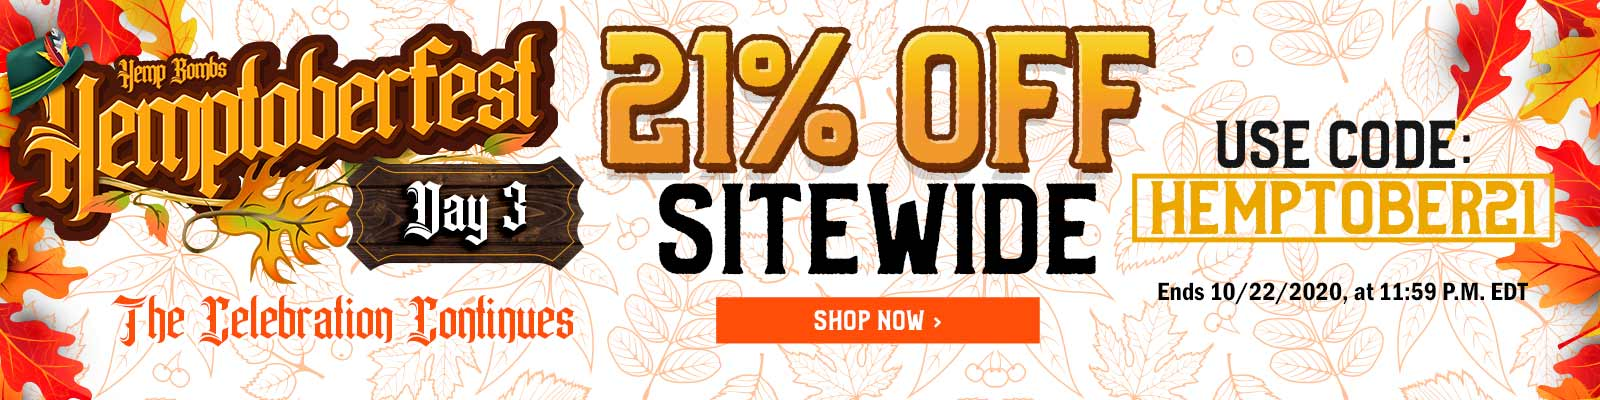 Hemptoberfest CBD Sale 21% Off Code: HEMPTOBER21